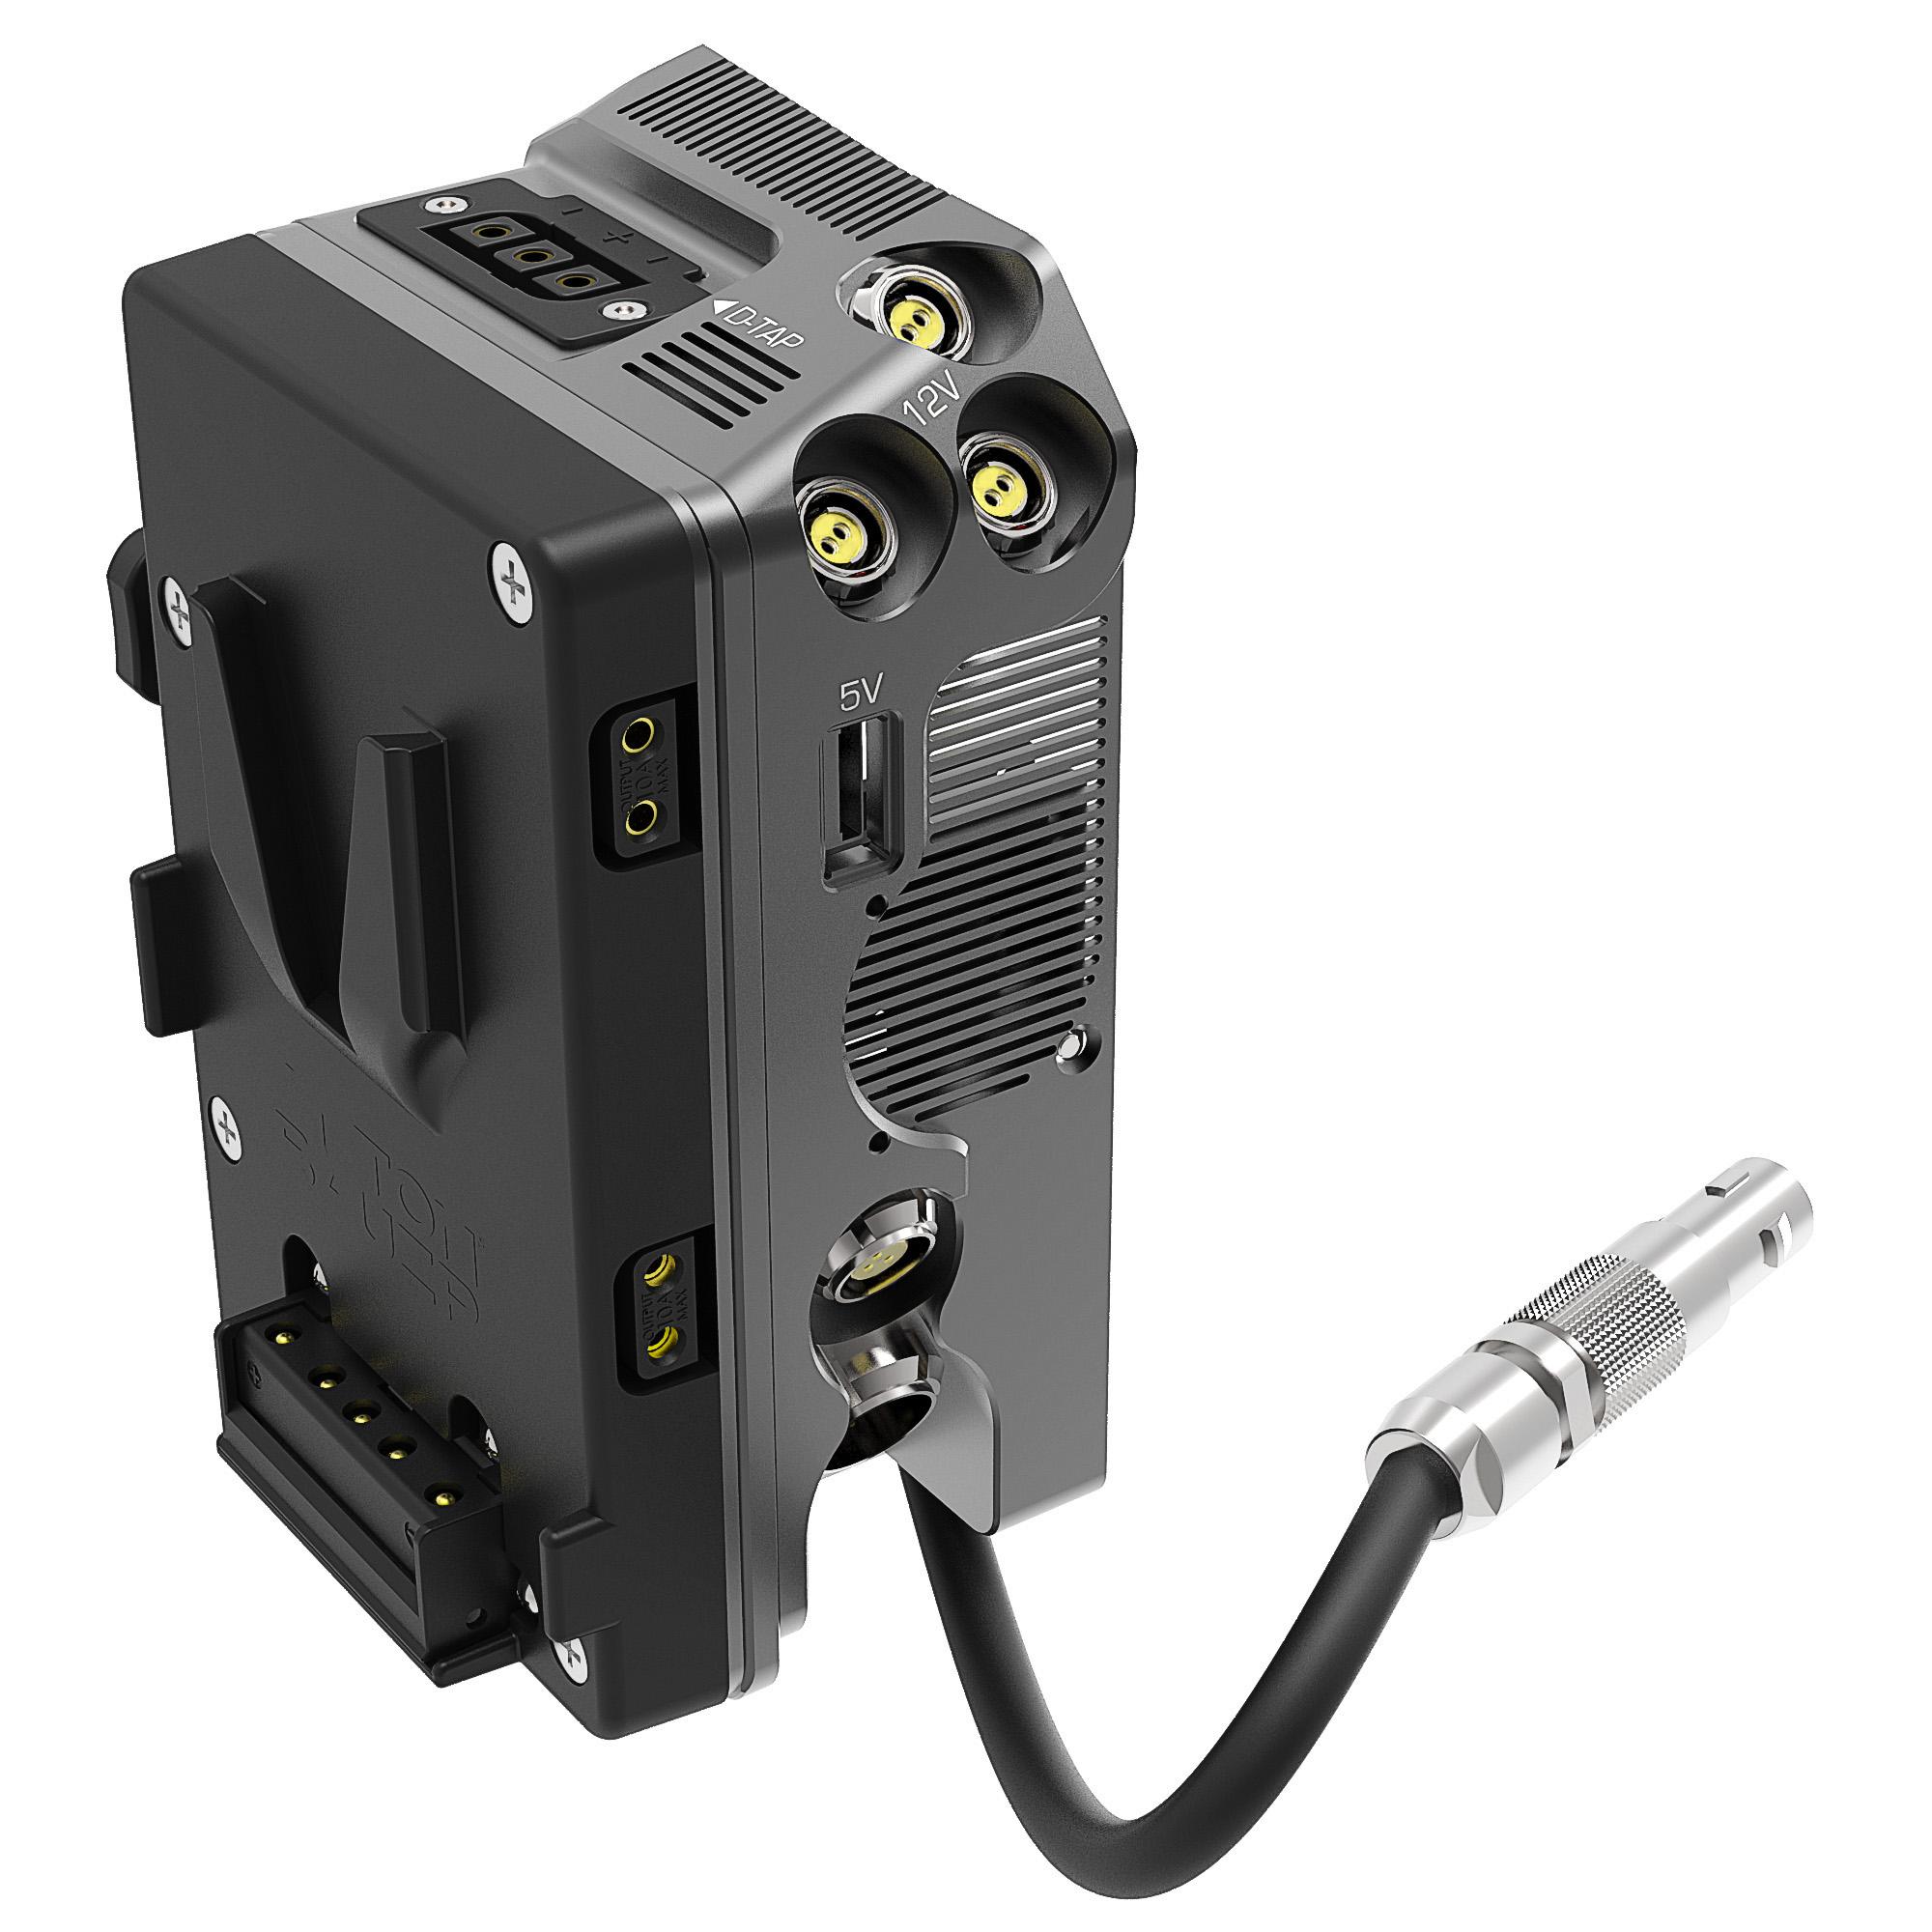 B4001.1002 Alexa Mini Power Distribution Module V Mount 2